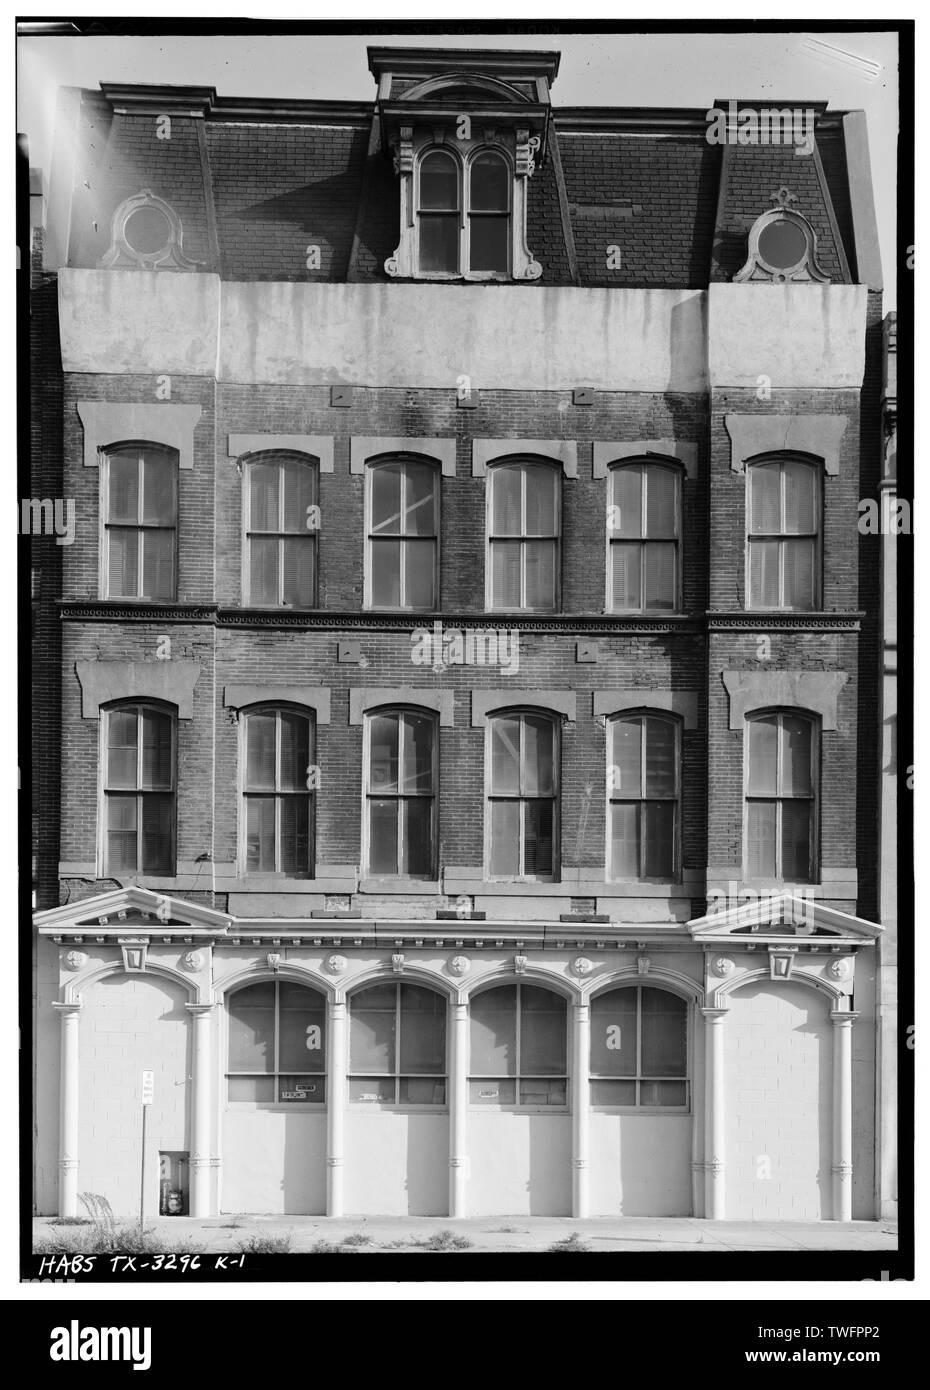 PRINCIPAL (NORTH) SIDE - Strand Historic District, Merchants Mutual Insurance Company Building, 2317-2319 Strand, Galveston, Galveston County, TX - Stock Image